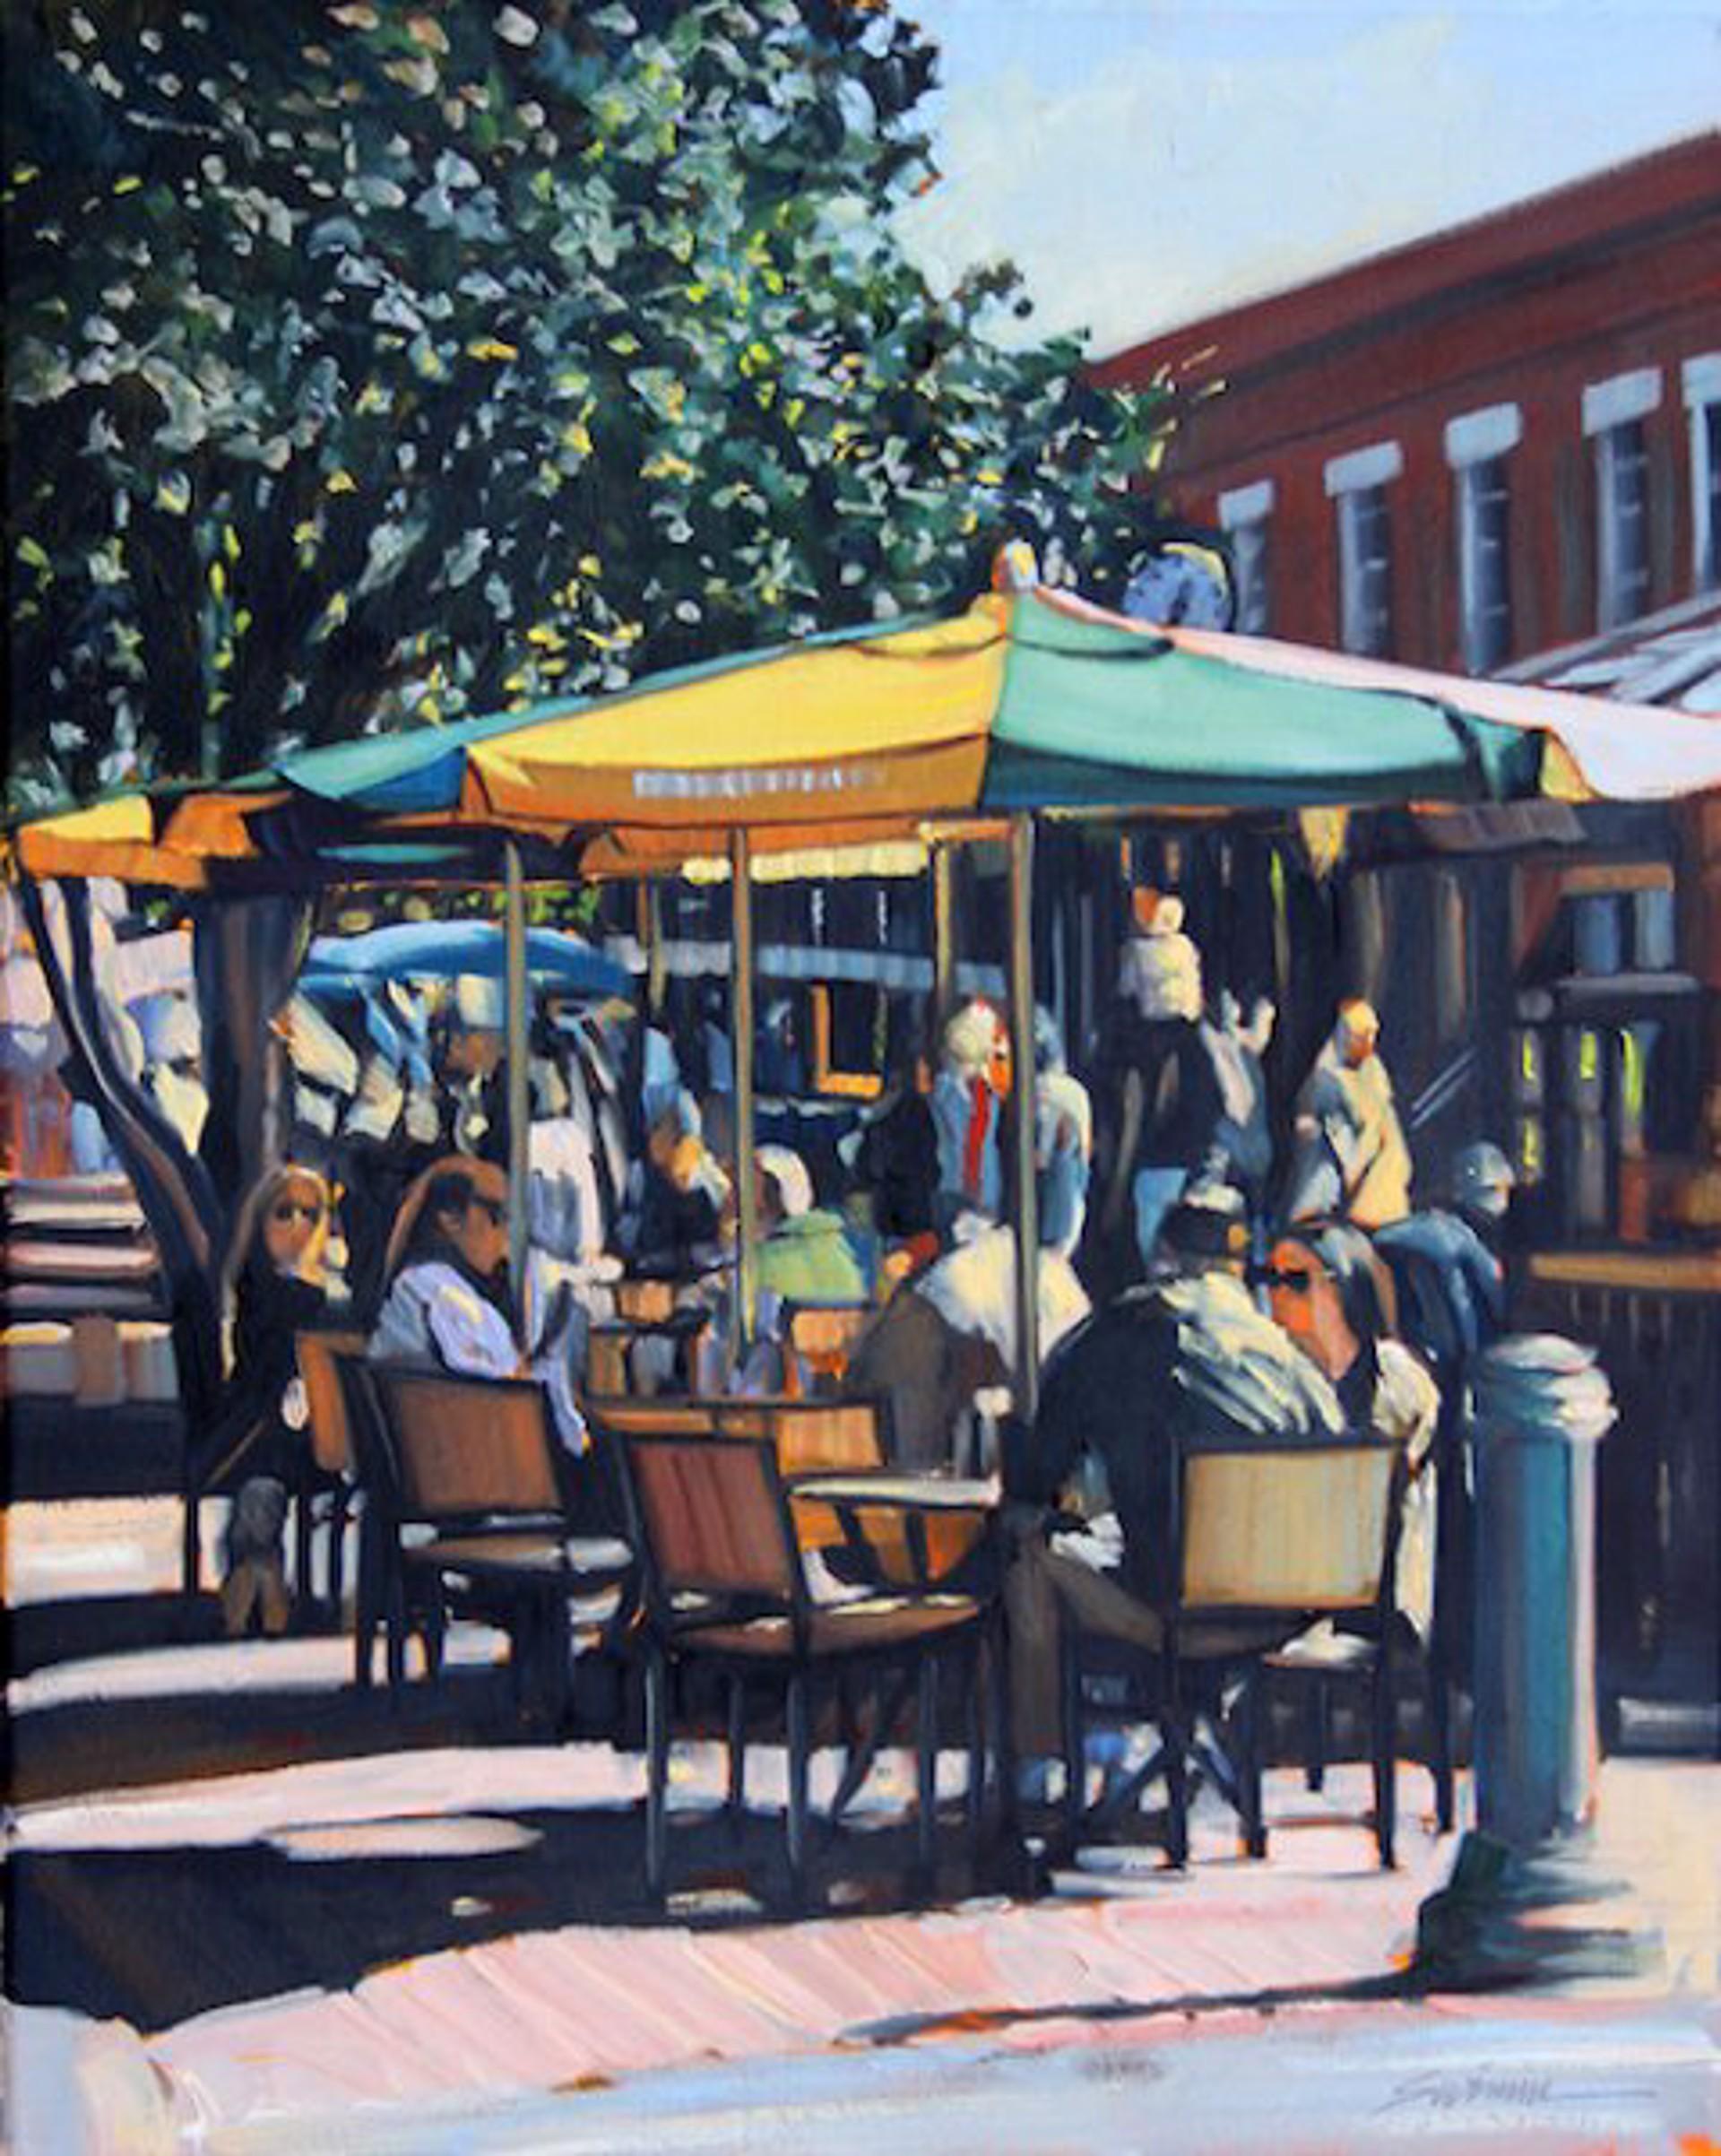 Tom Swimm: Saturday In Savannah by Tom Swimm